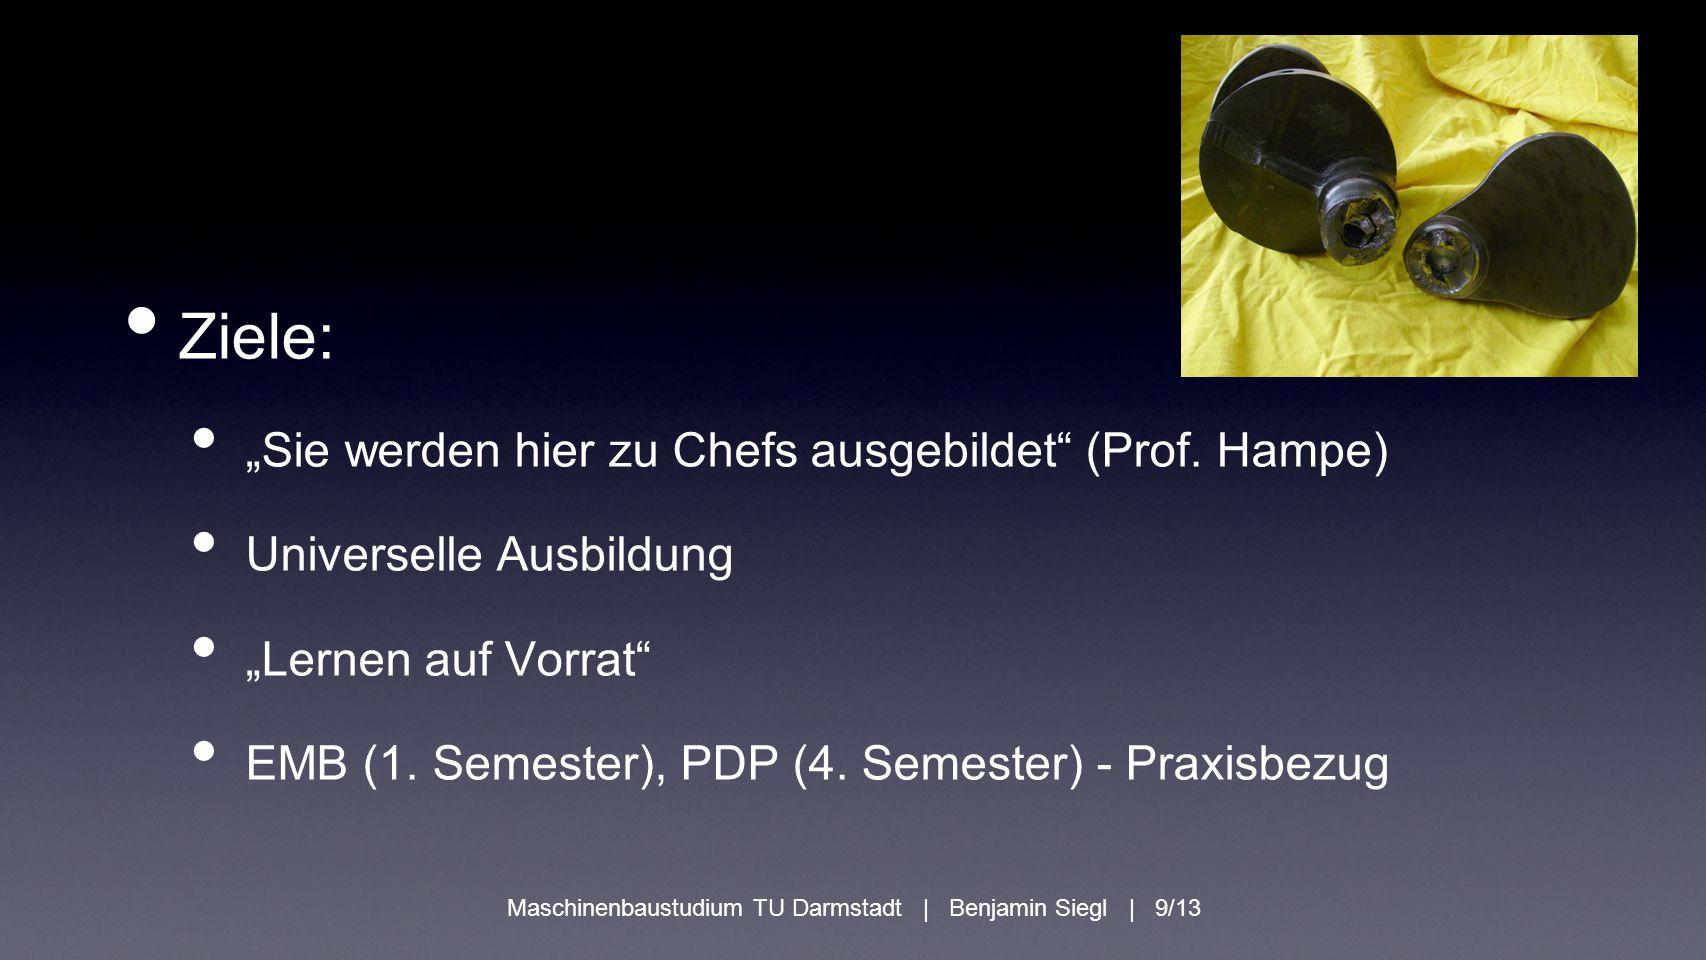 Maschinenbaustudium TU Darmstadt | Benjamin Siegl | 9/13